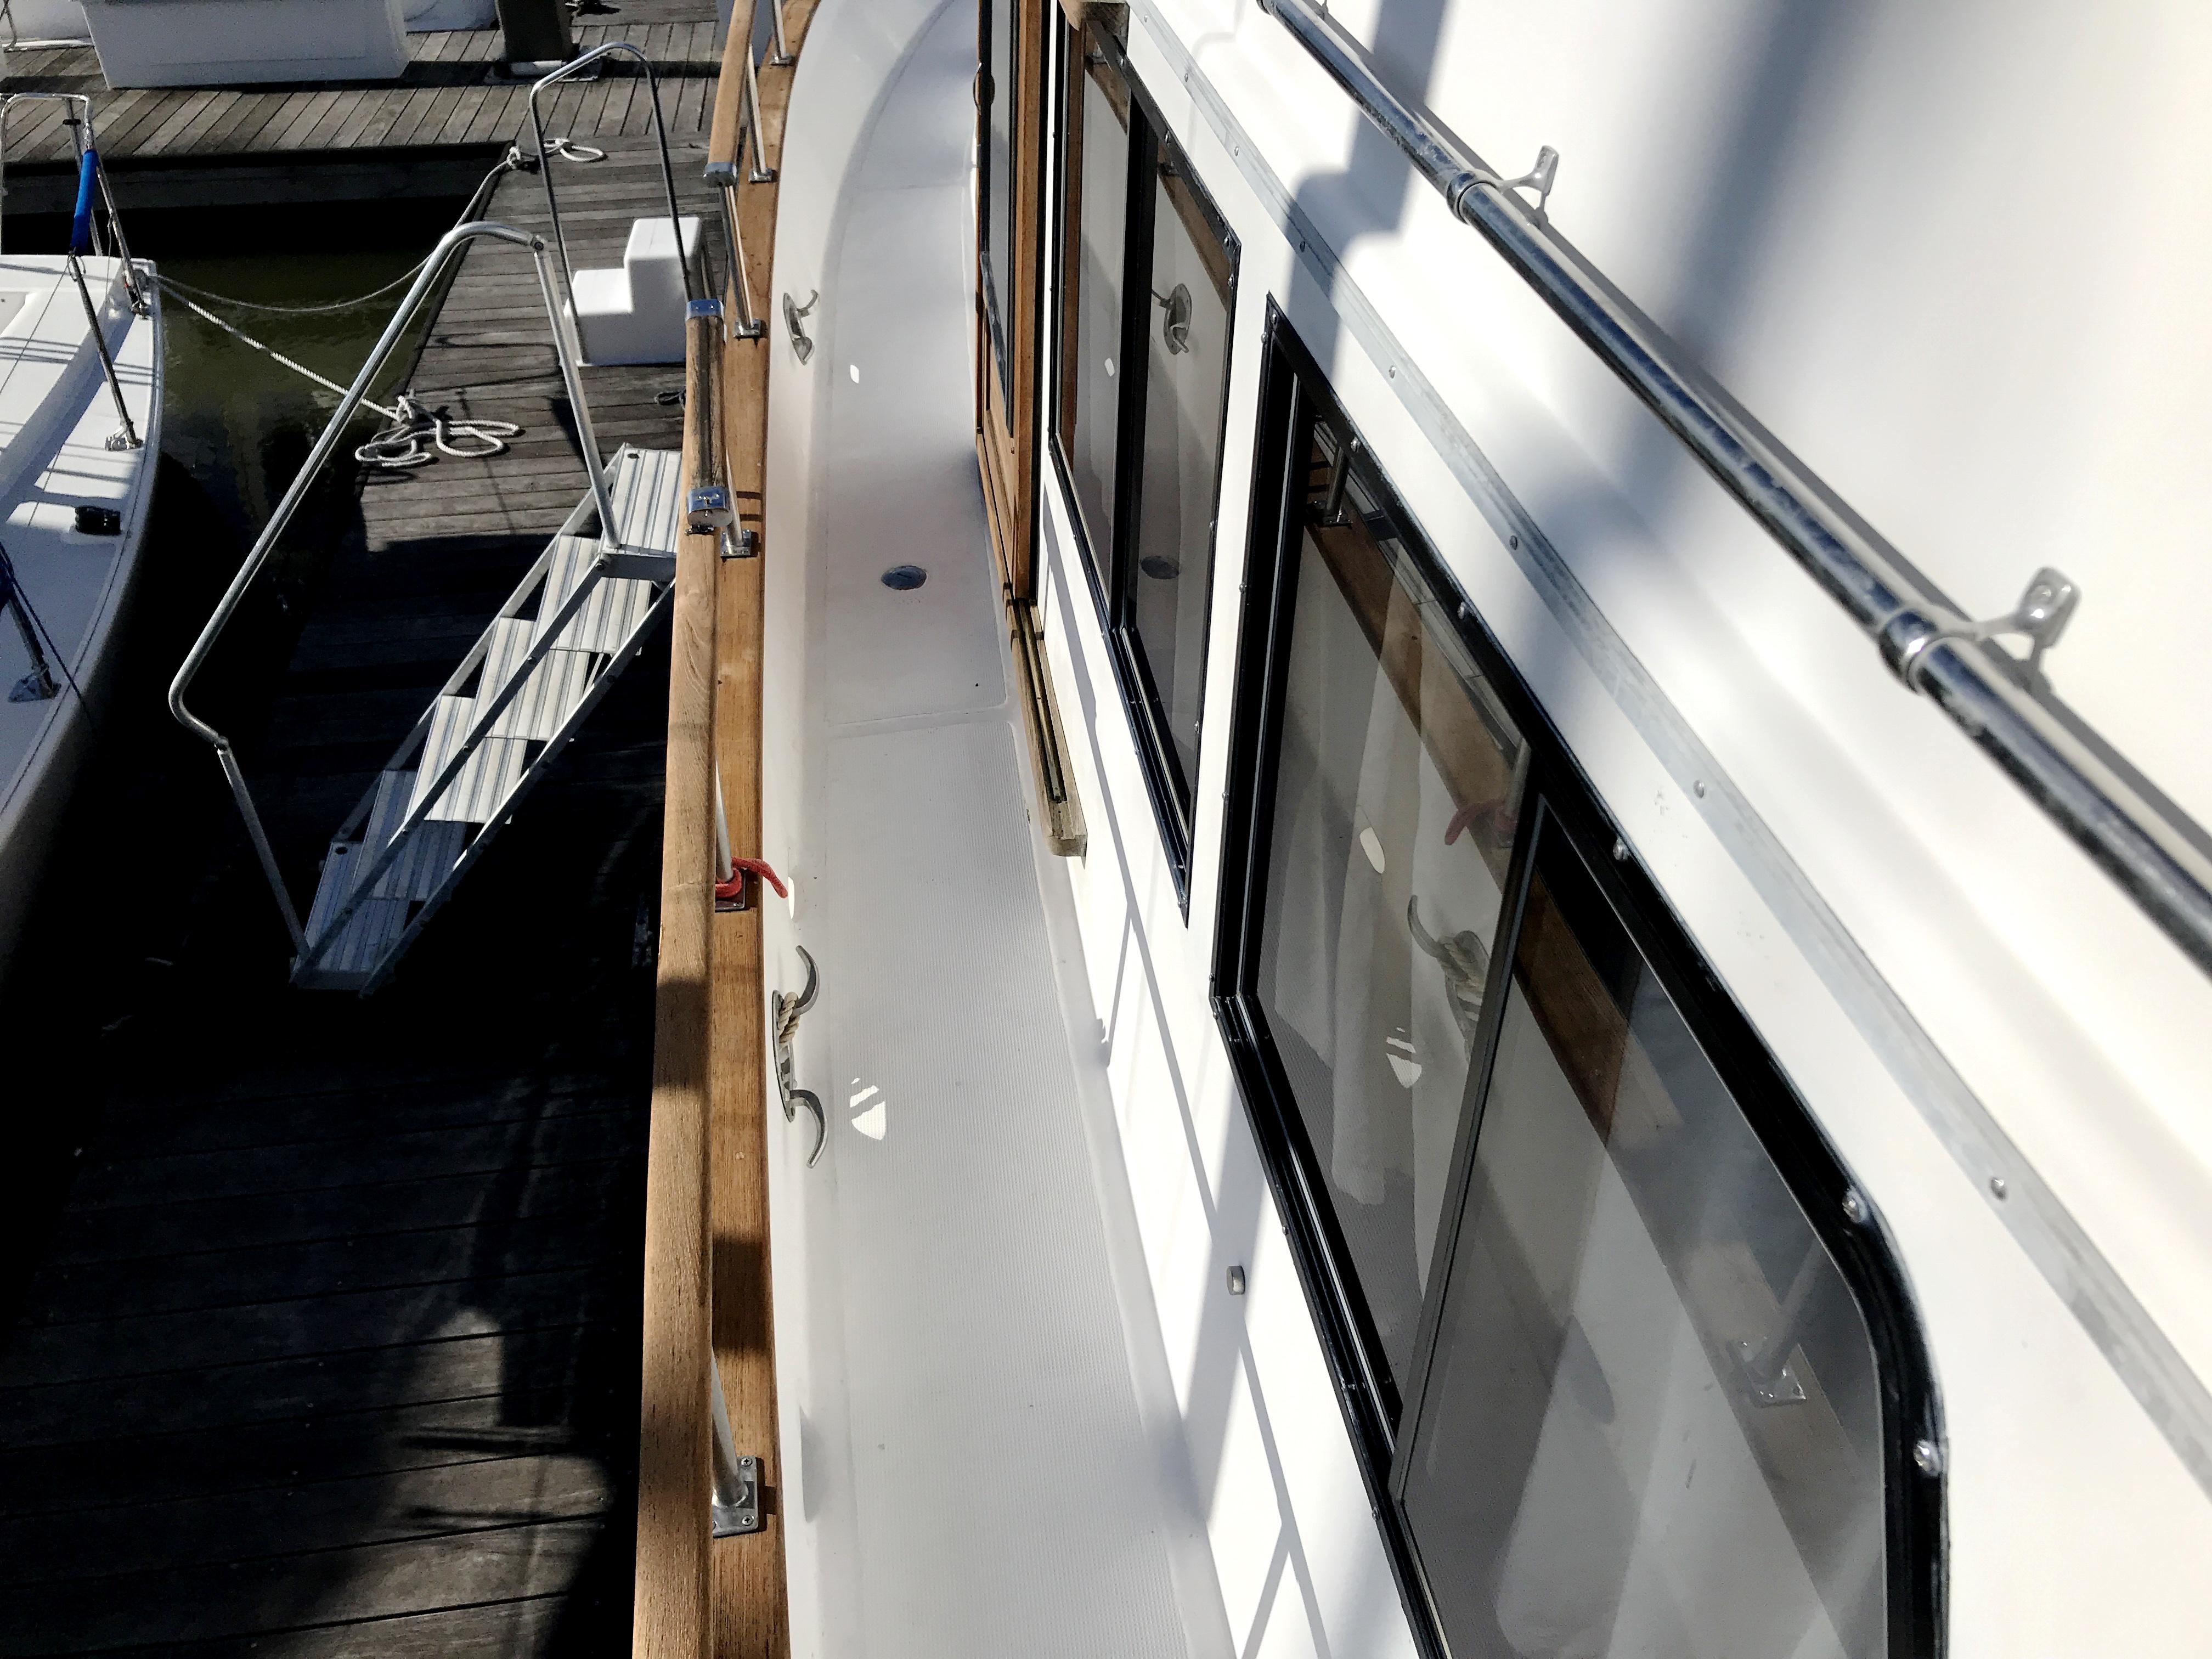 Sea Ranger SUNDECK - wide side decks and new windows